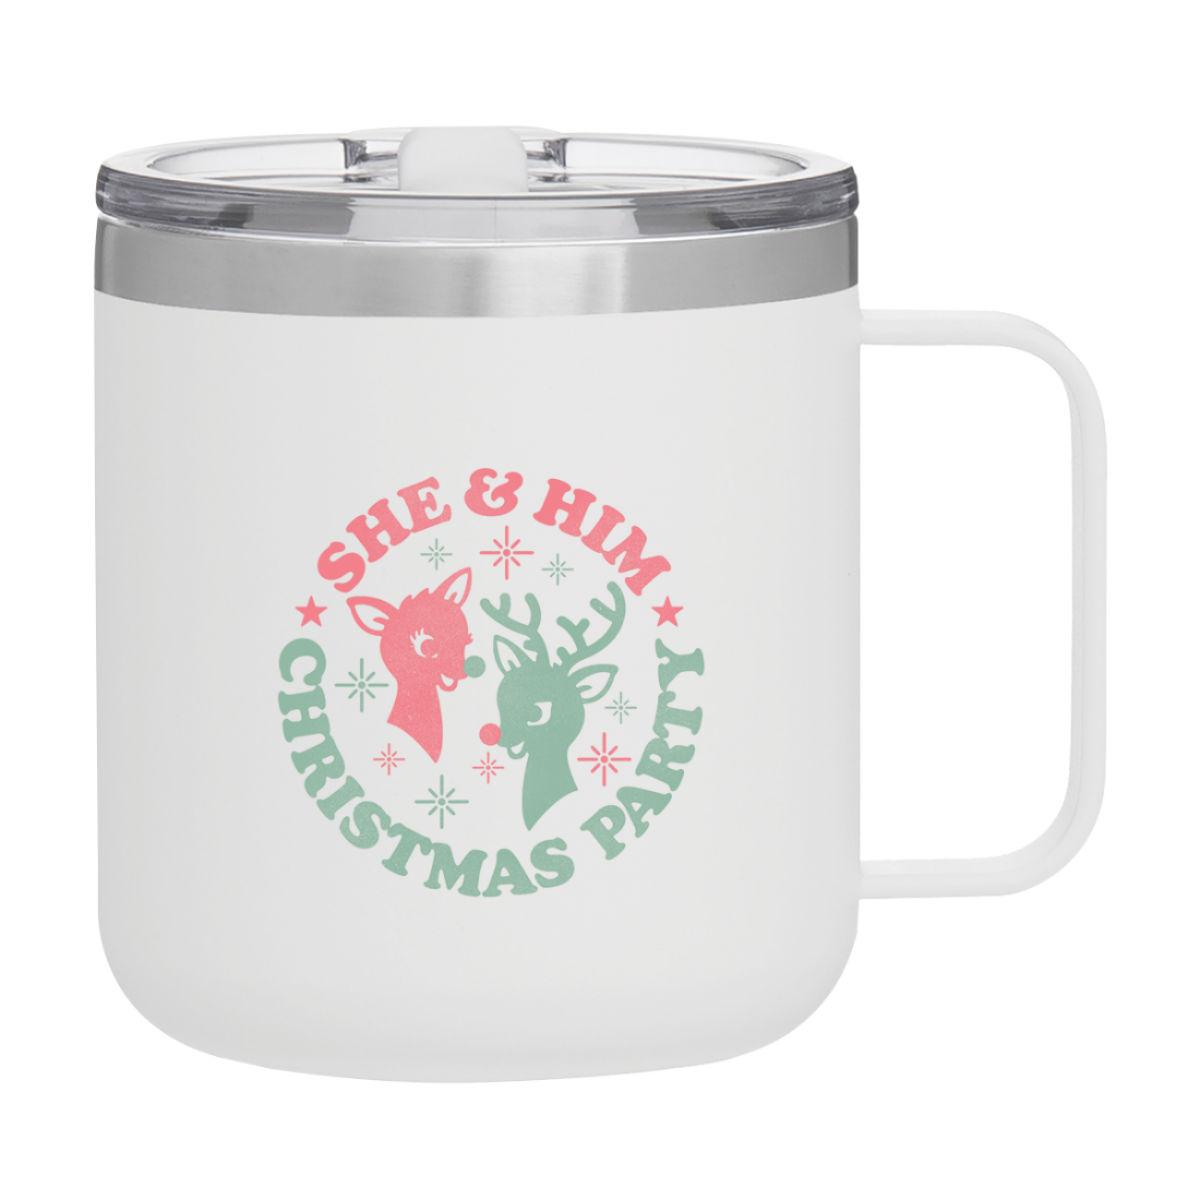 Premium Insulated Mug